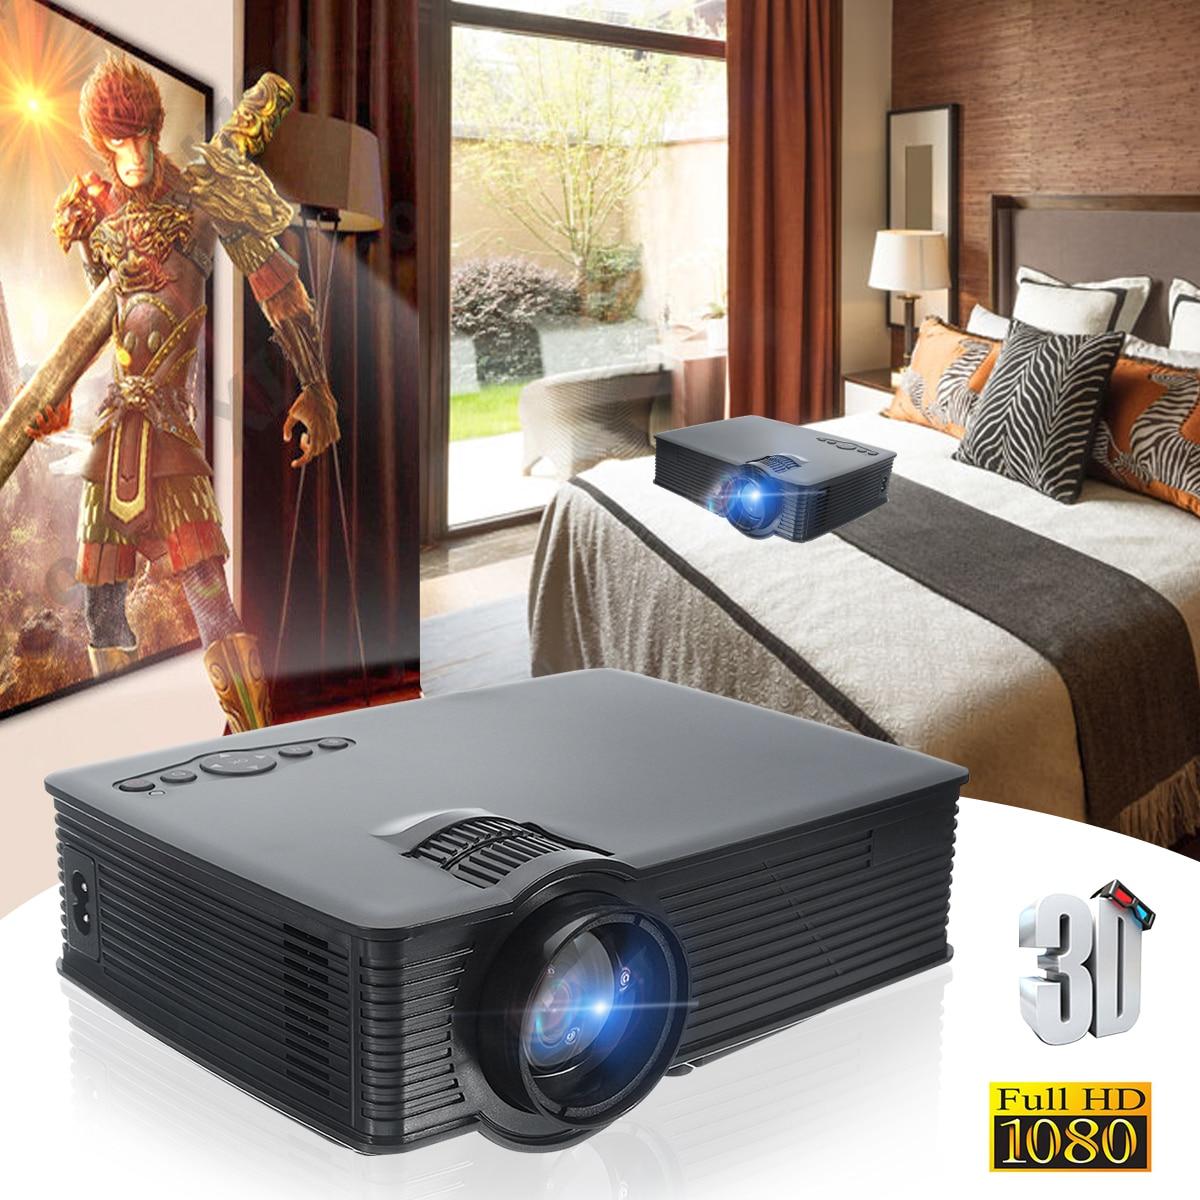 Thinyou GP-9 3000 Lumens Projector Black Mini Projector HDMI Digital Home Theater